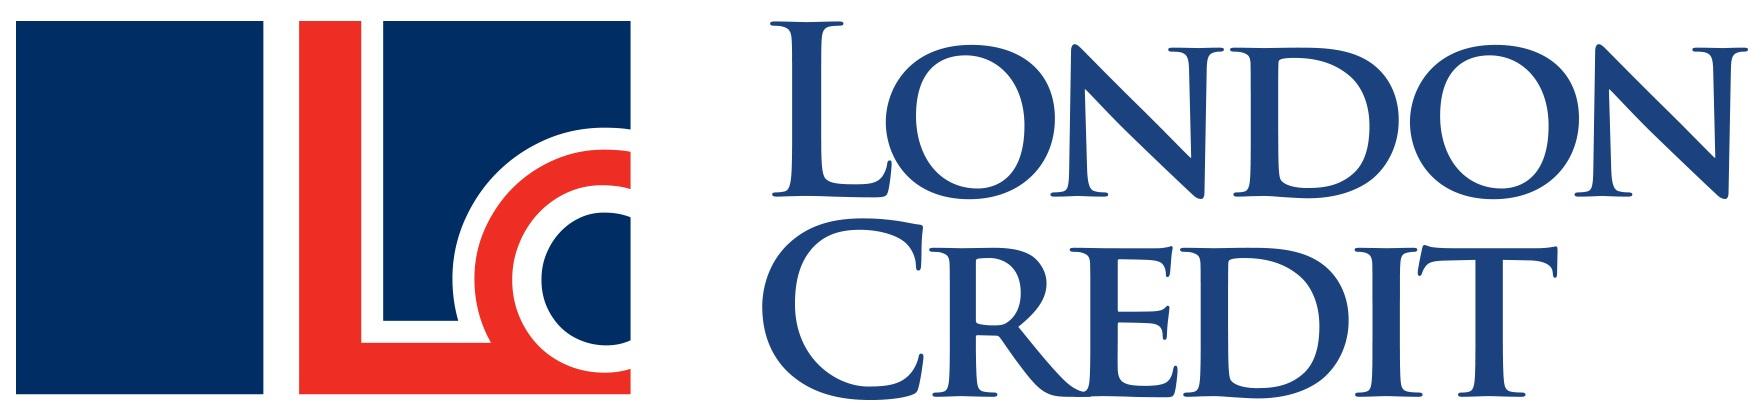 LONDON CREDIT_LOGO_RGB1.jpg